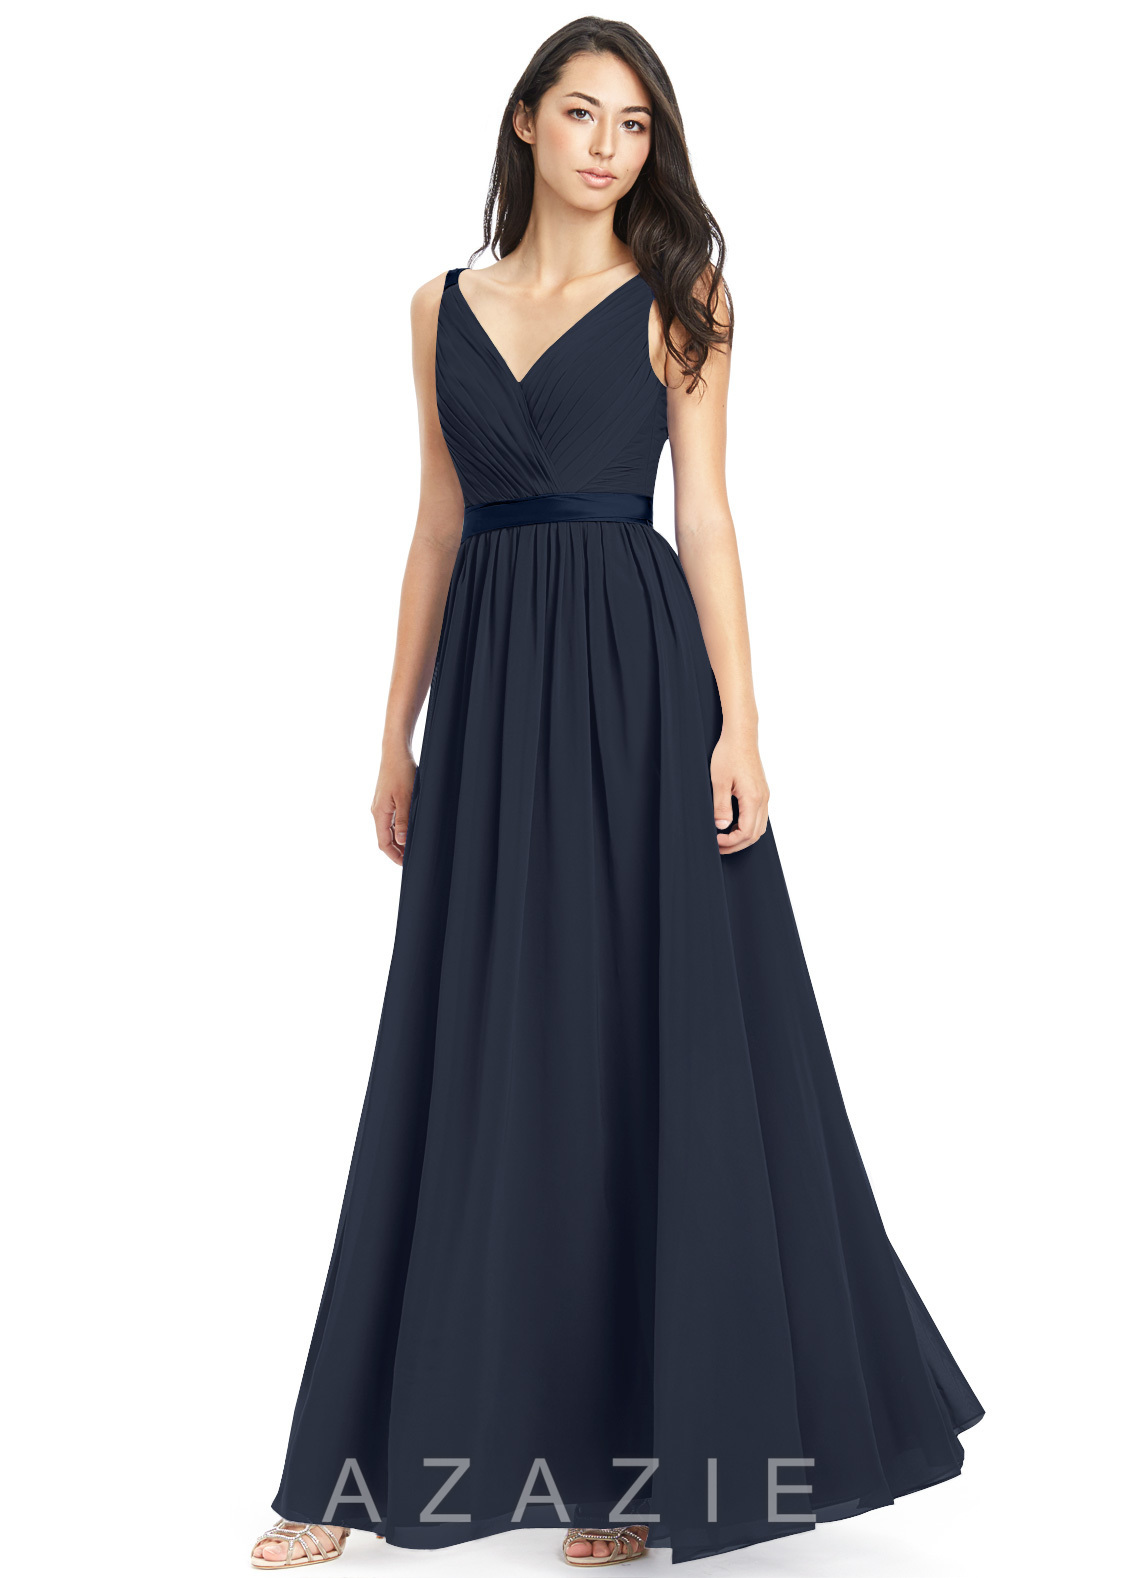 c0a93dcbf2 Azazie Leanna Bridesmaid Dress - Dark Navy | Azazie